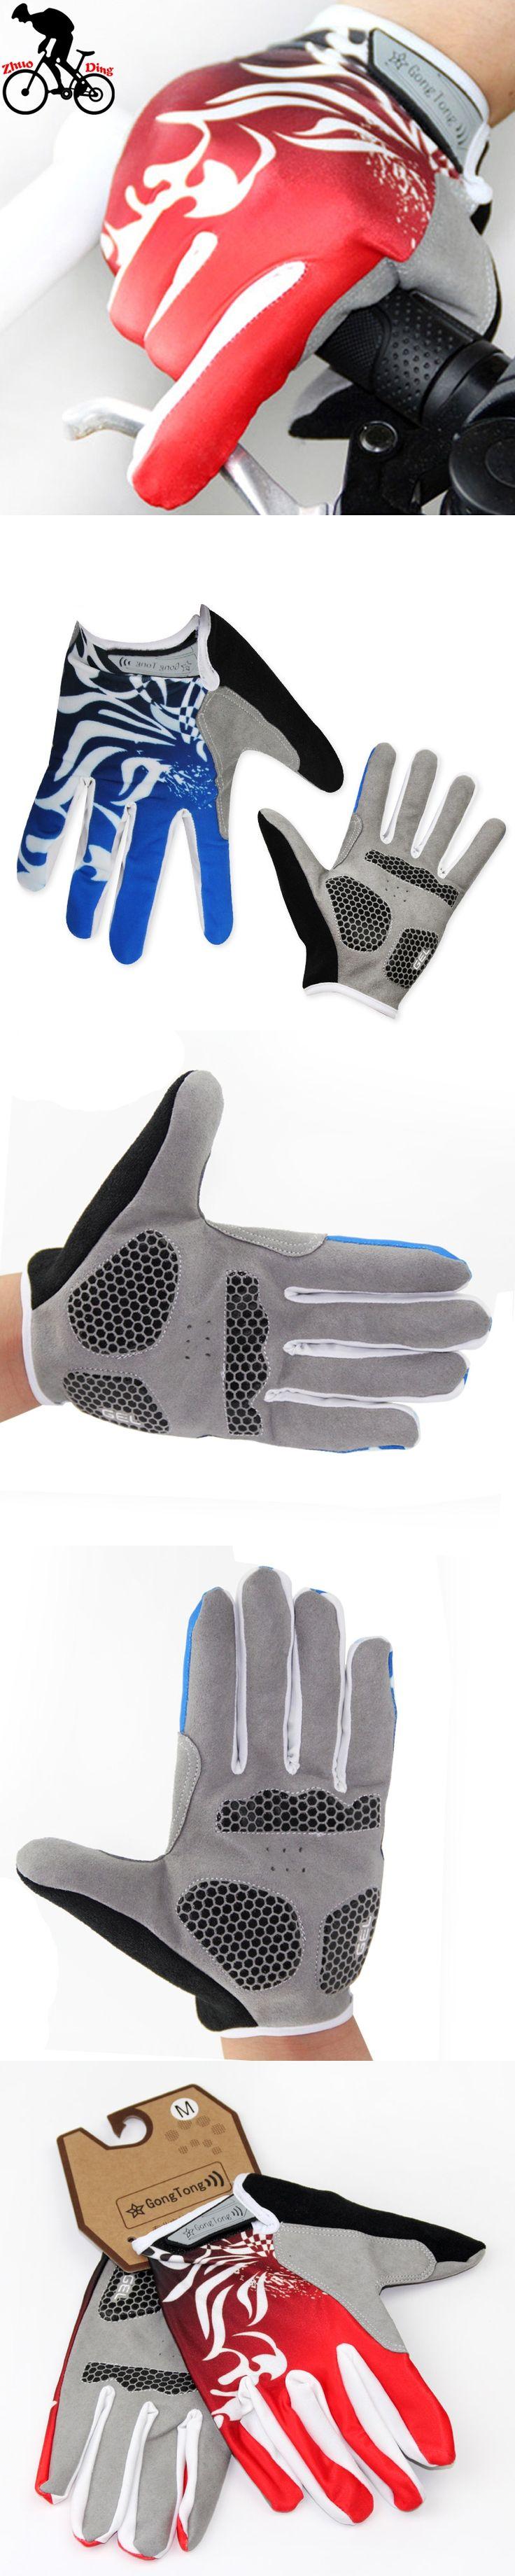 zhuoding Bike Glove Full Finger  Bike Cycling Gloves Man Women Long Mountain Biking Gloves Motorcycle Gloves